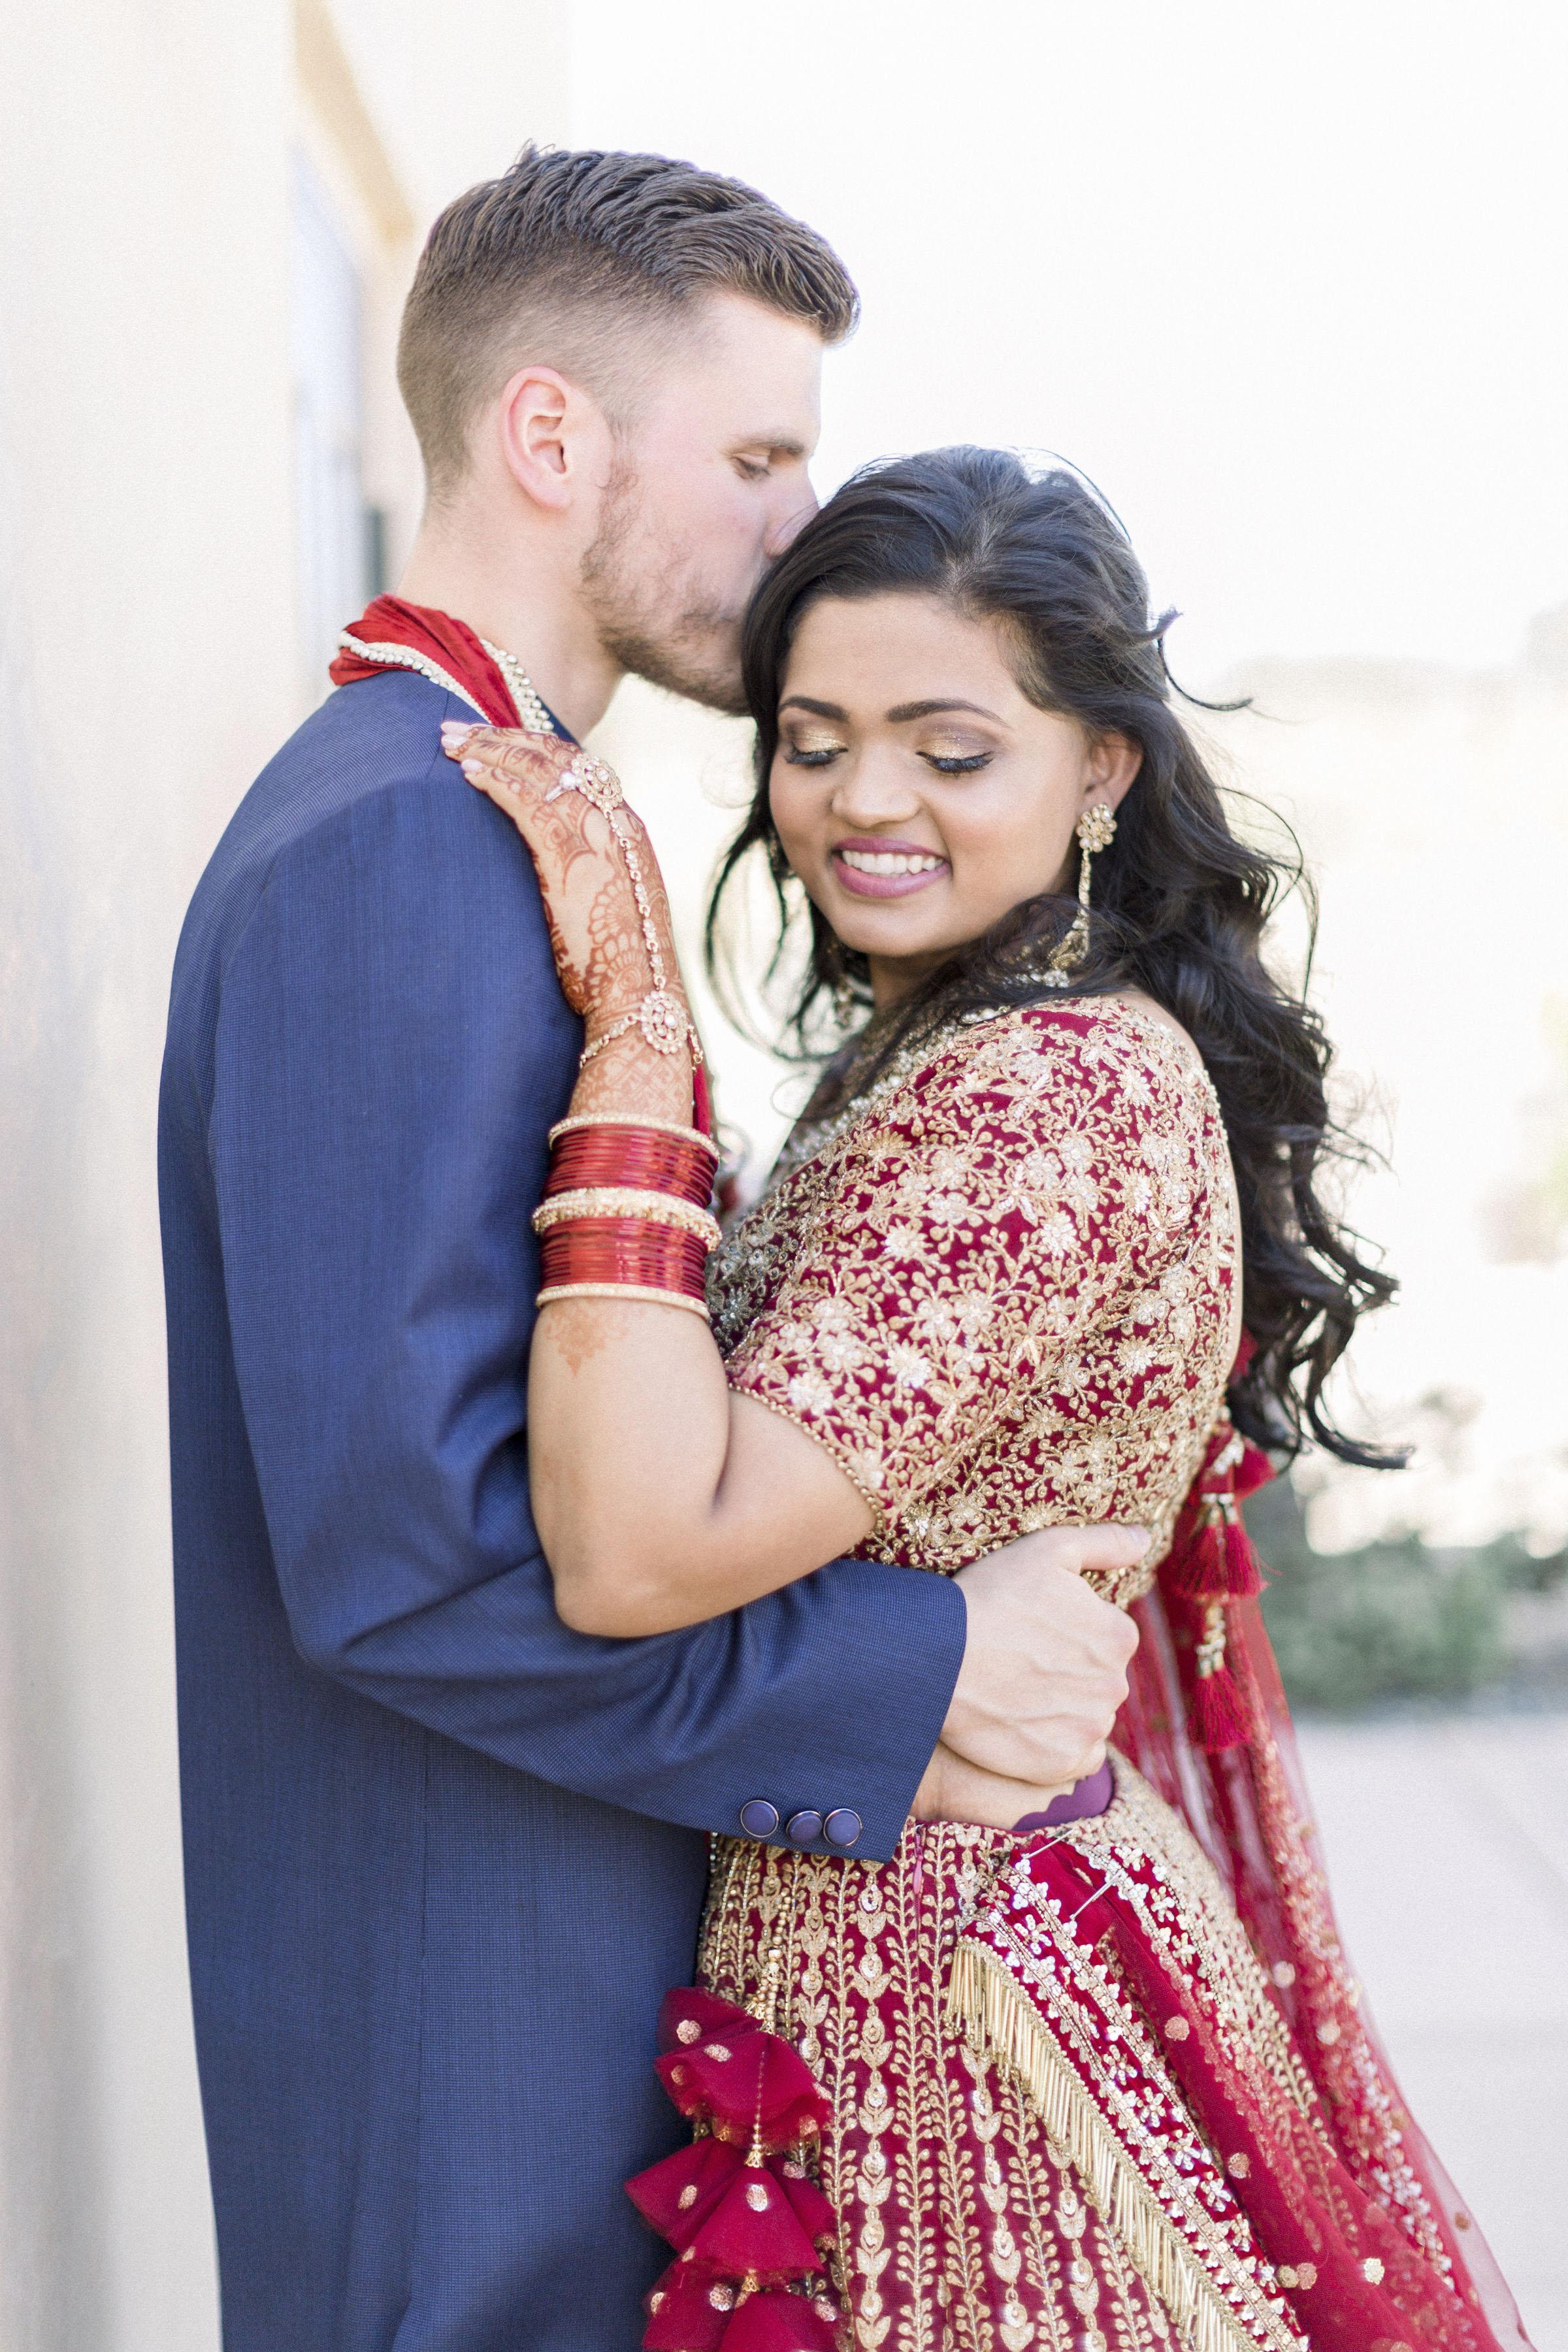 Domenica Beauty _ Hair and Makeup Artist _Wedding _ Temecula, CA _ Pratishtha and Christopher _ 16.JPG